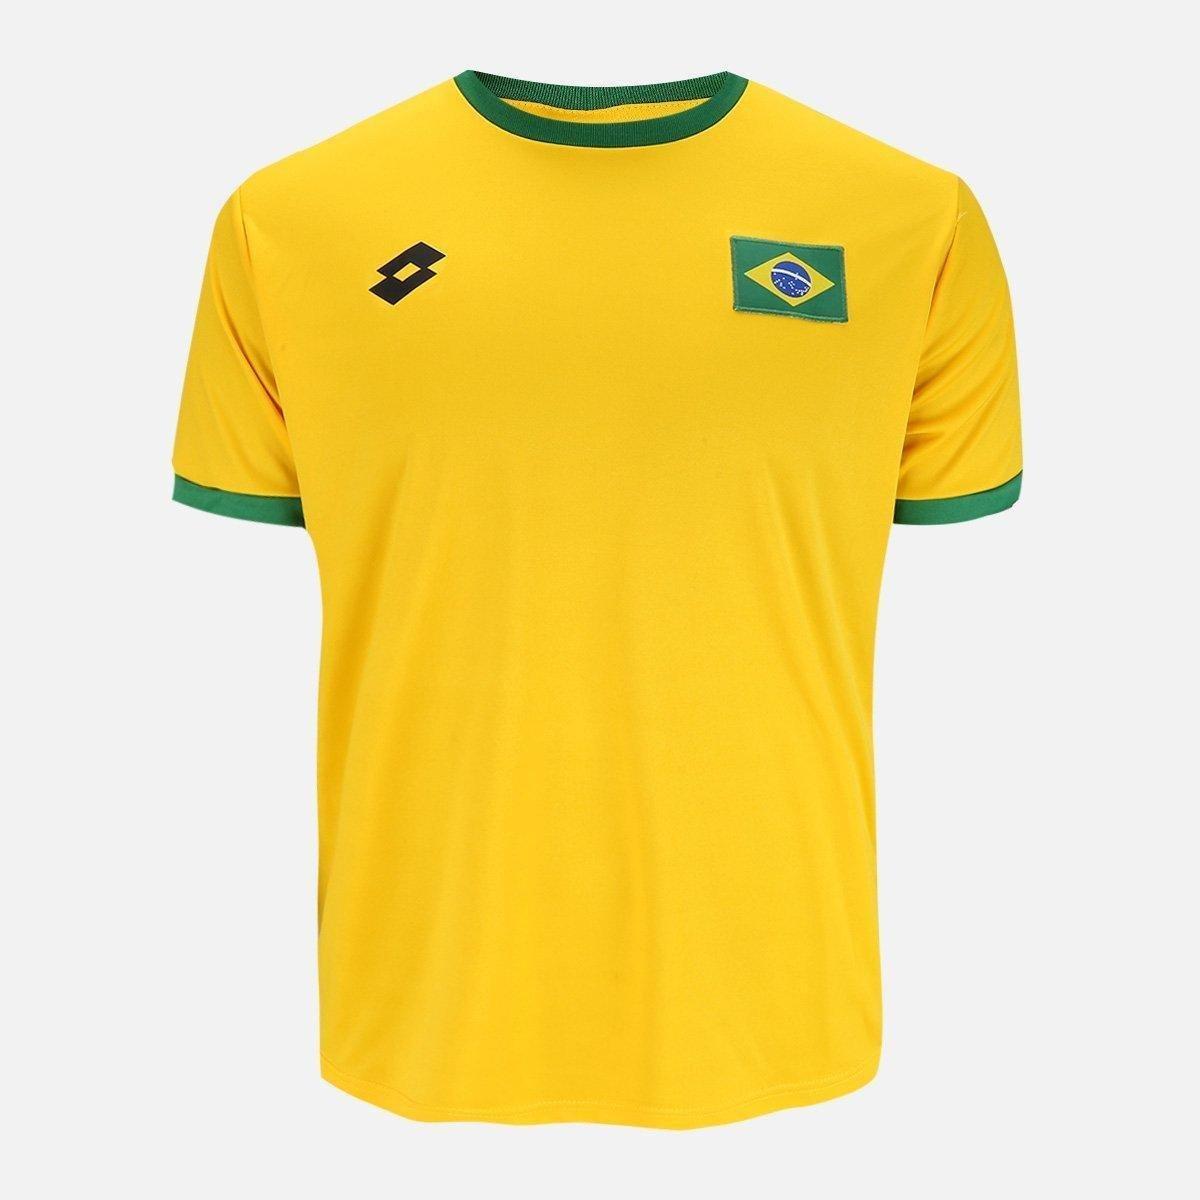 521df8348b Camisa Lotto Brasil Masculina - Amarelo e Verde - Compre Agora ...